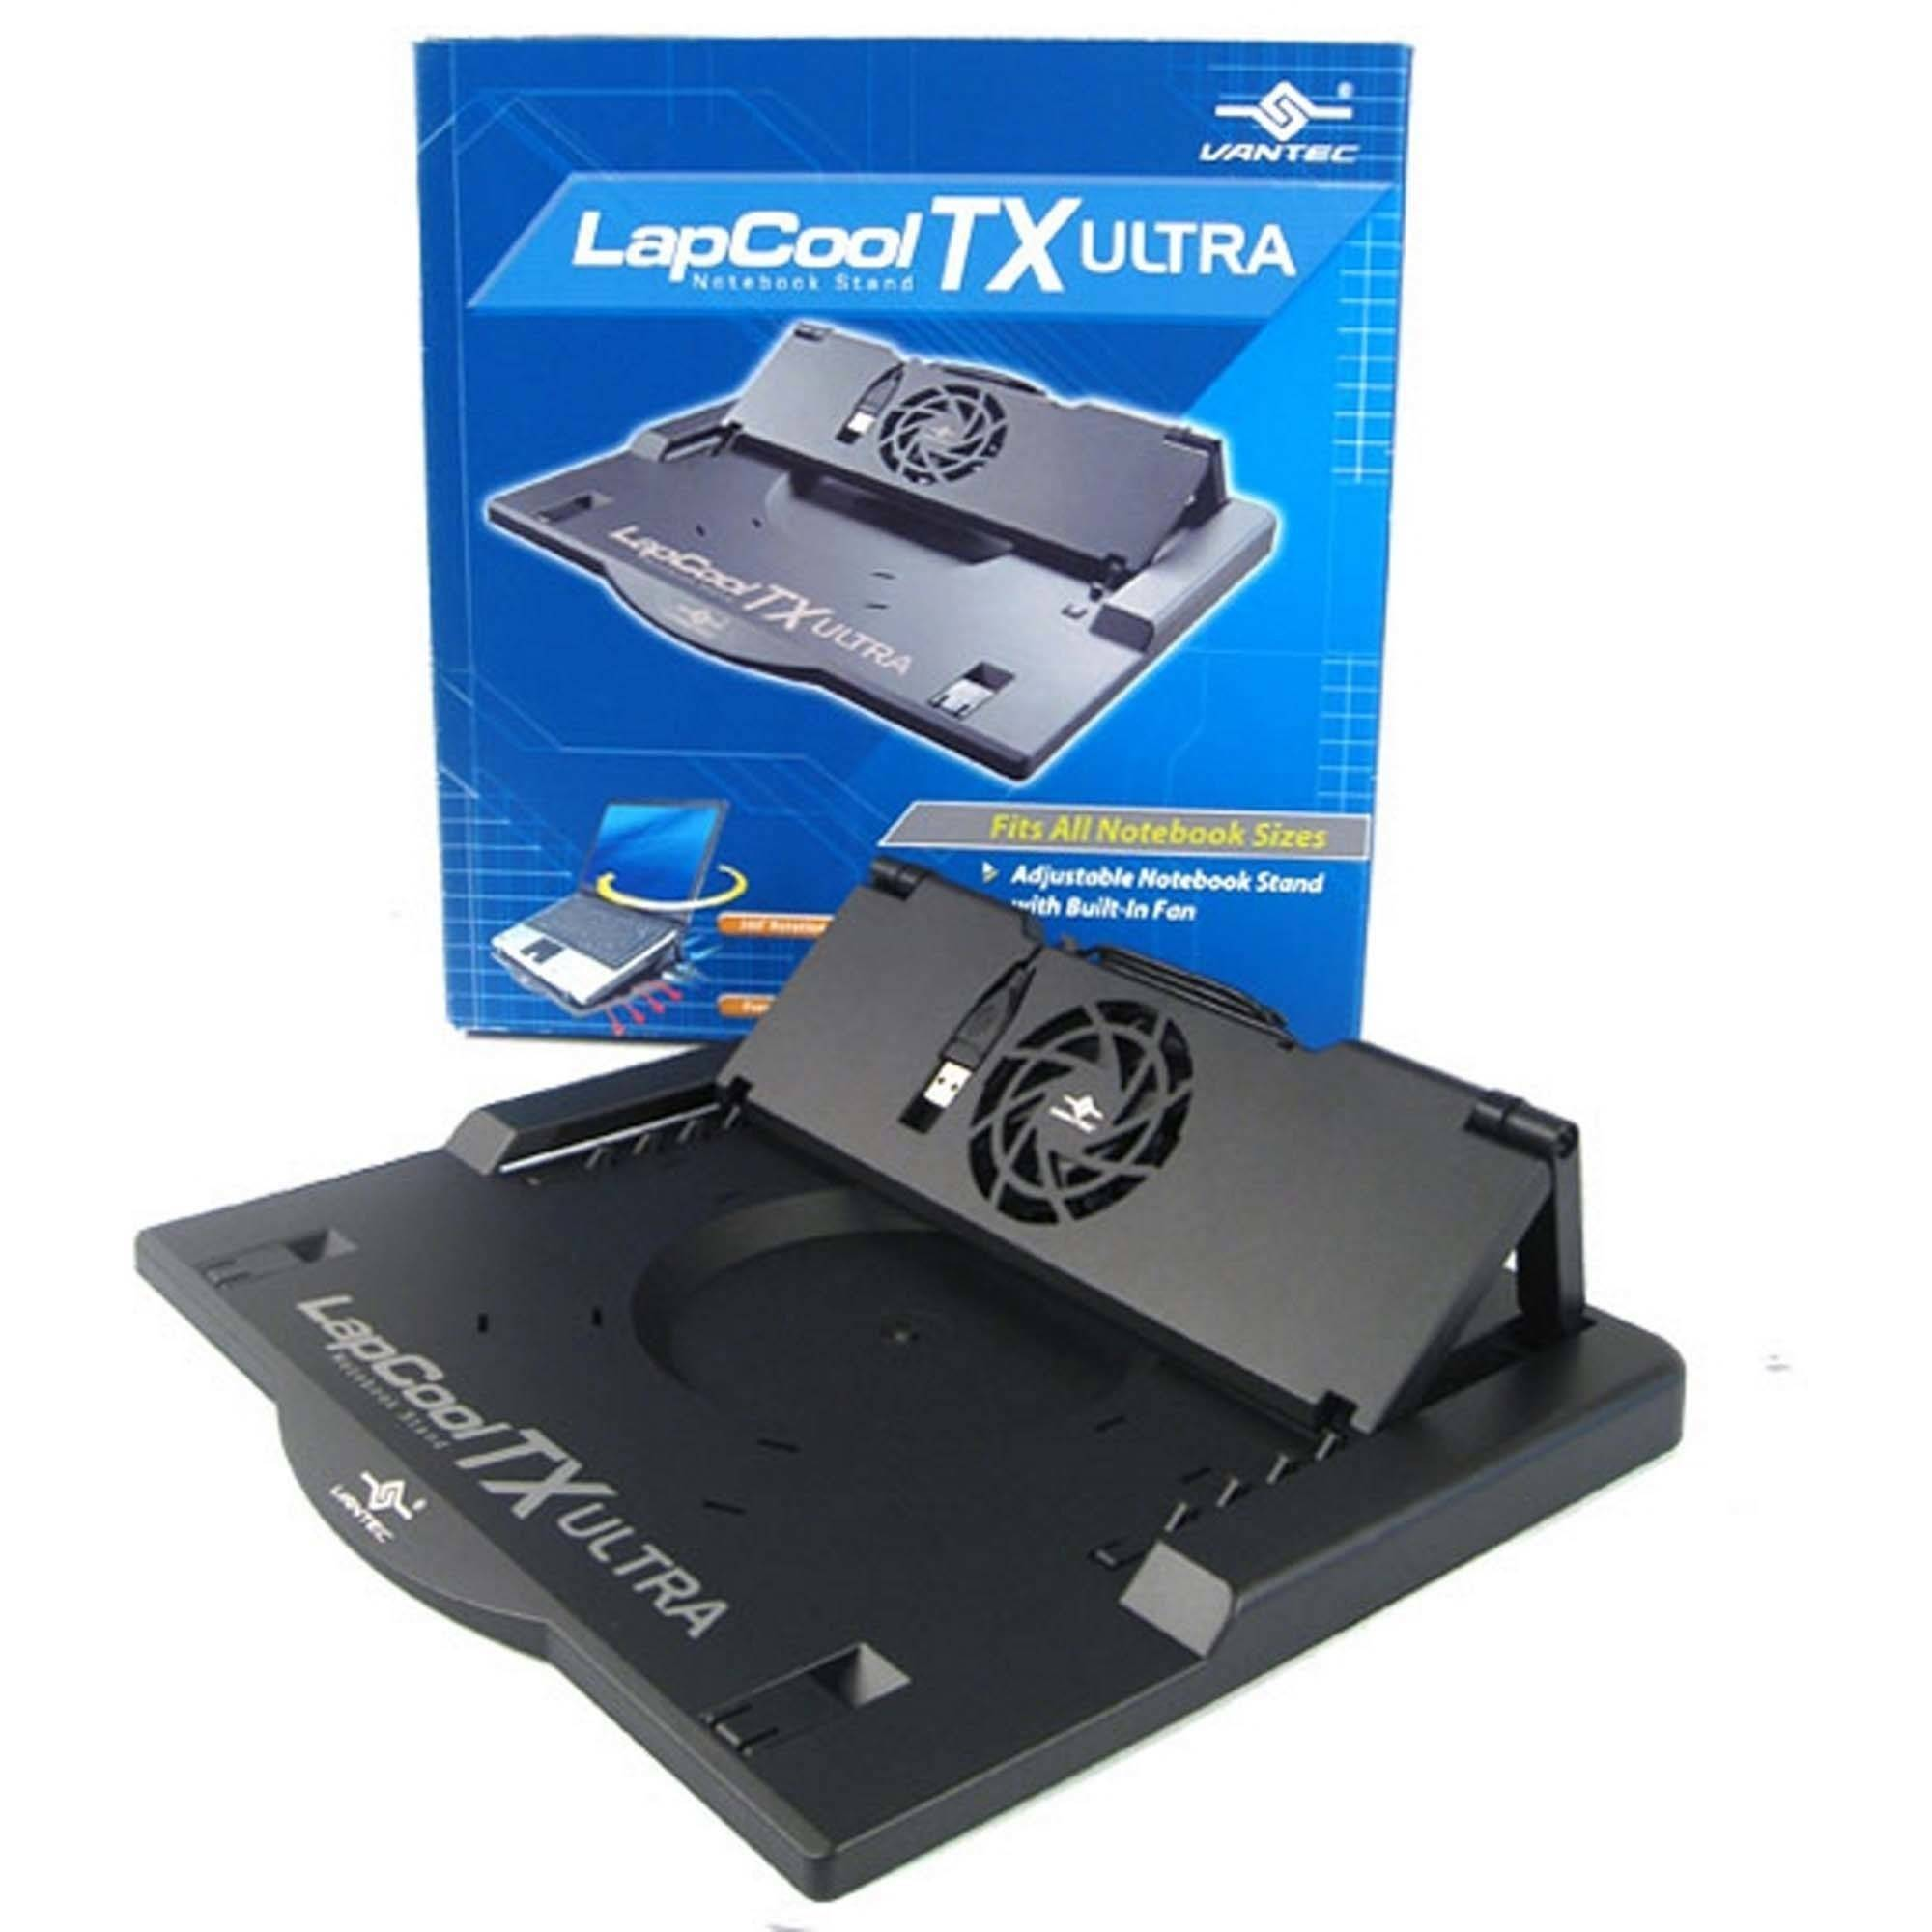 Vantec LPC-460TX LapCool TX Ultra-Adjustable NB Stand with Built-in Fan, Black